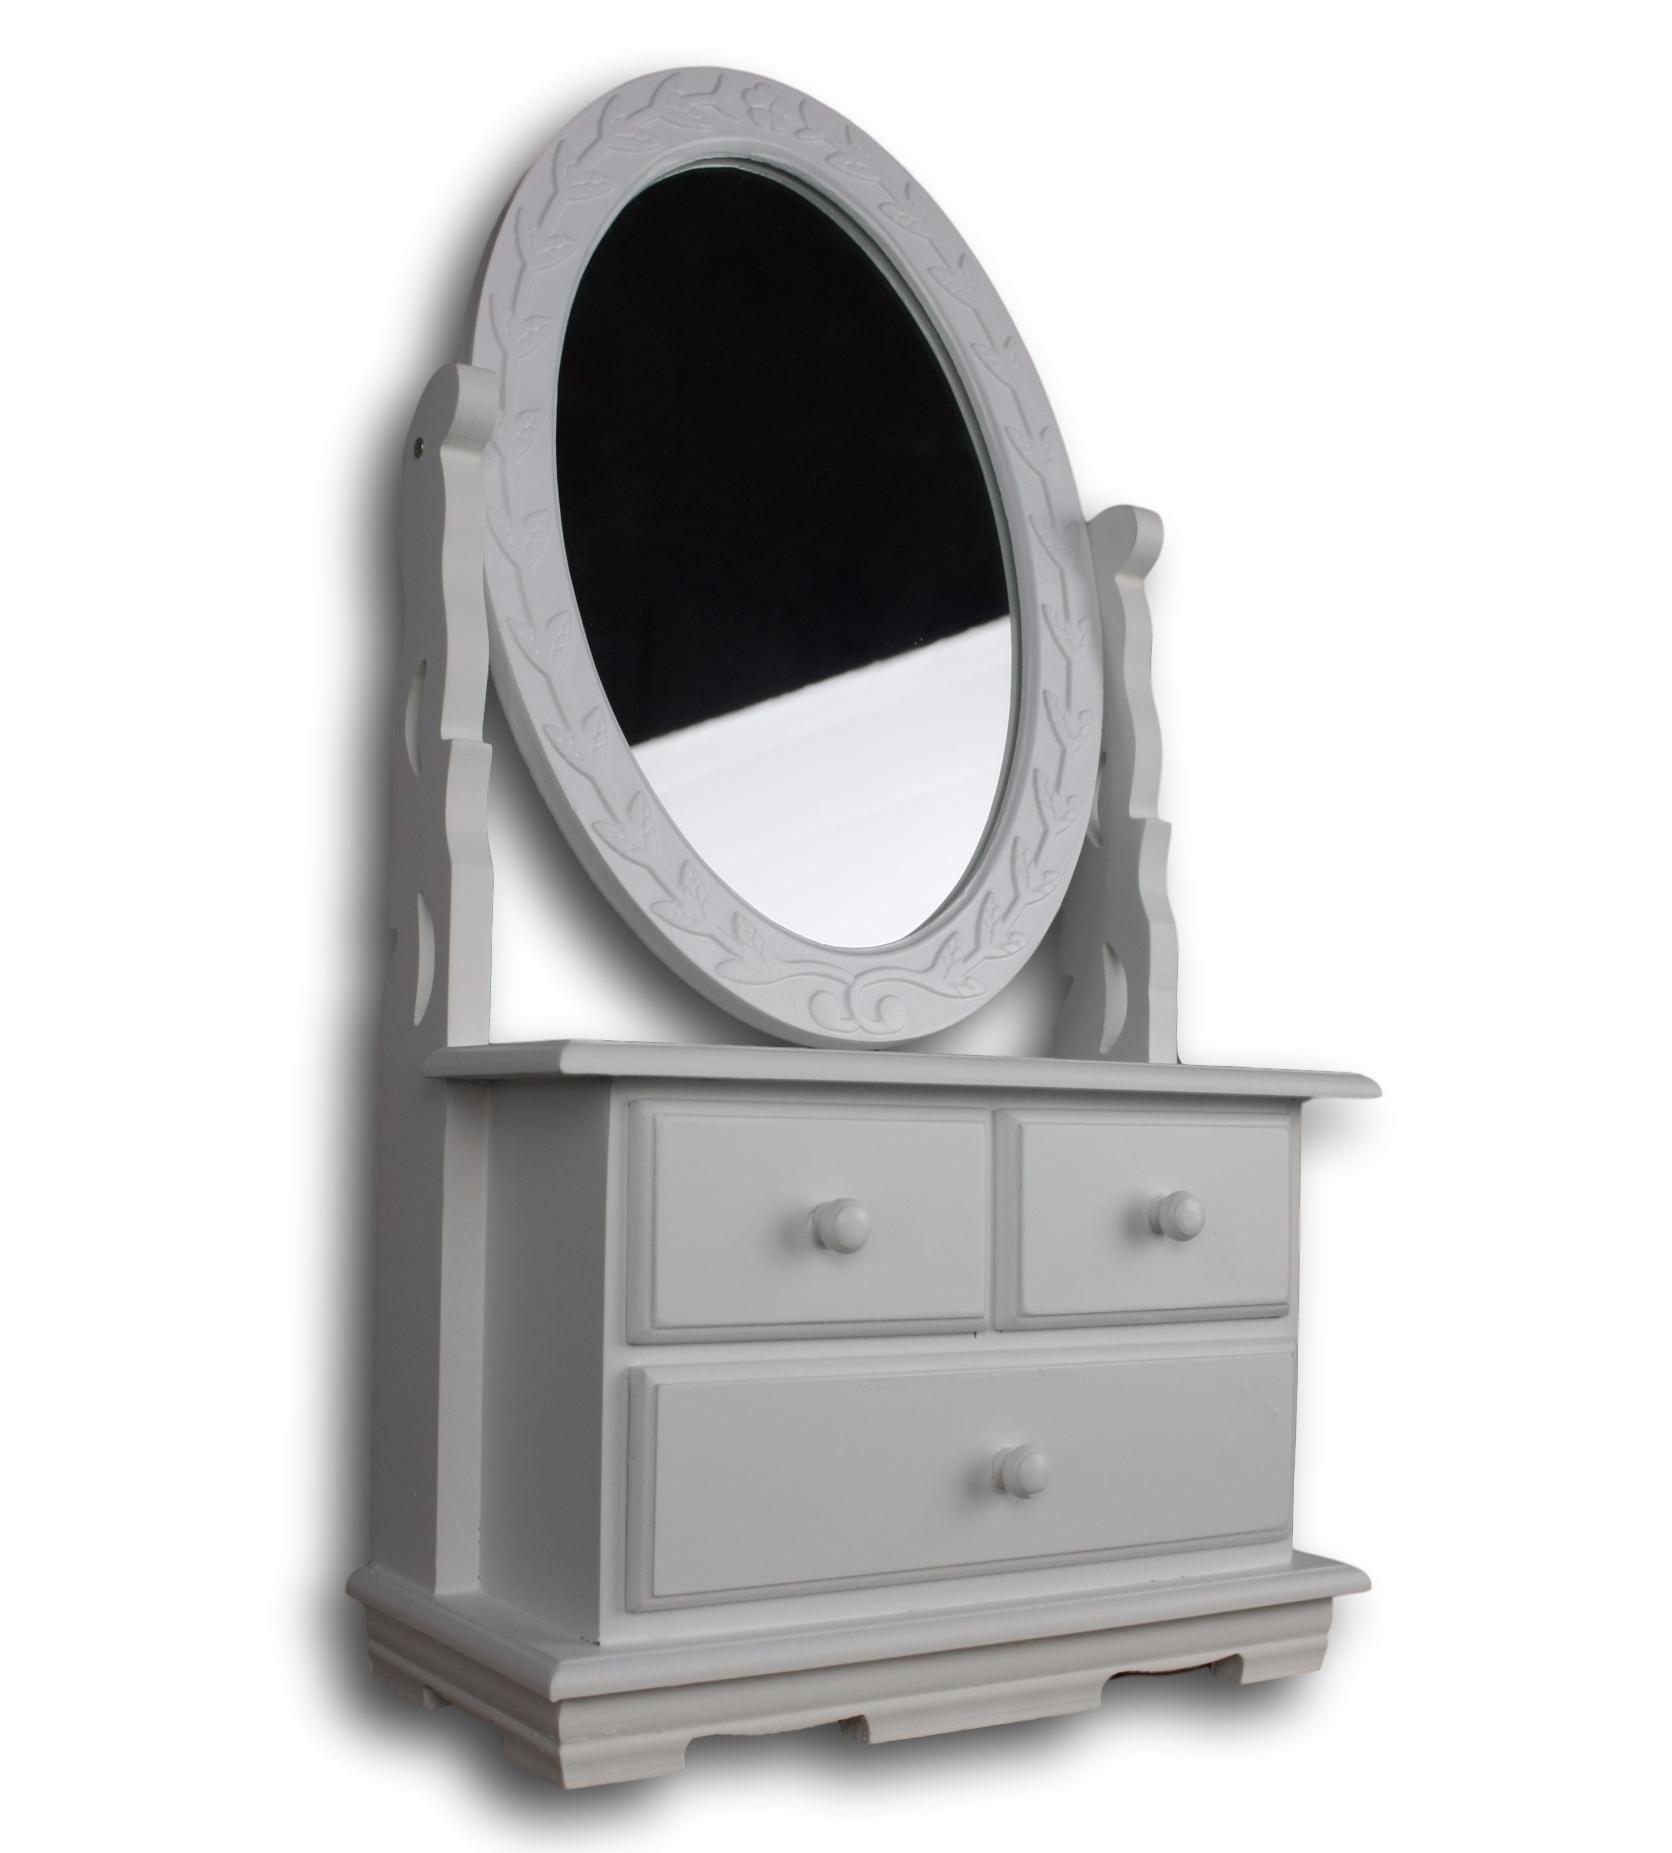 frisiertisch spiegel frisierkommode wei antik holz schminktisch schminkspiegel ebay. Black Bedroom Furniture Sets. Home Design Ideas